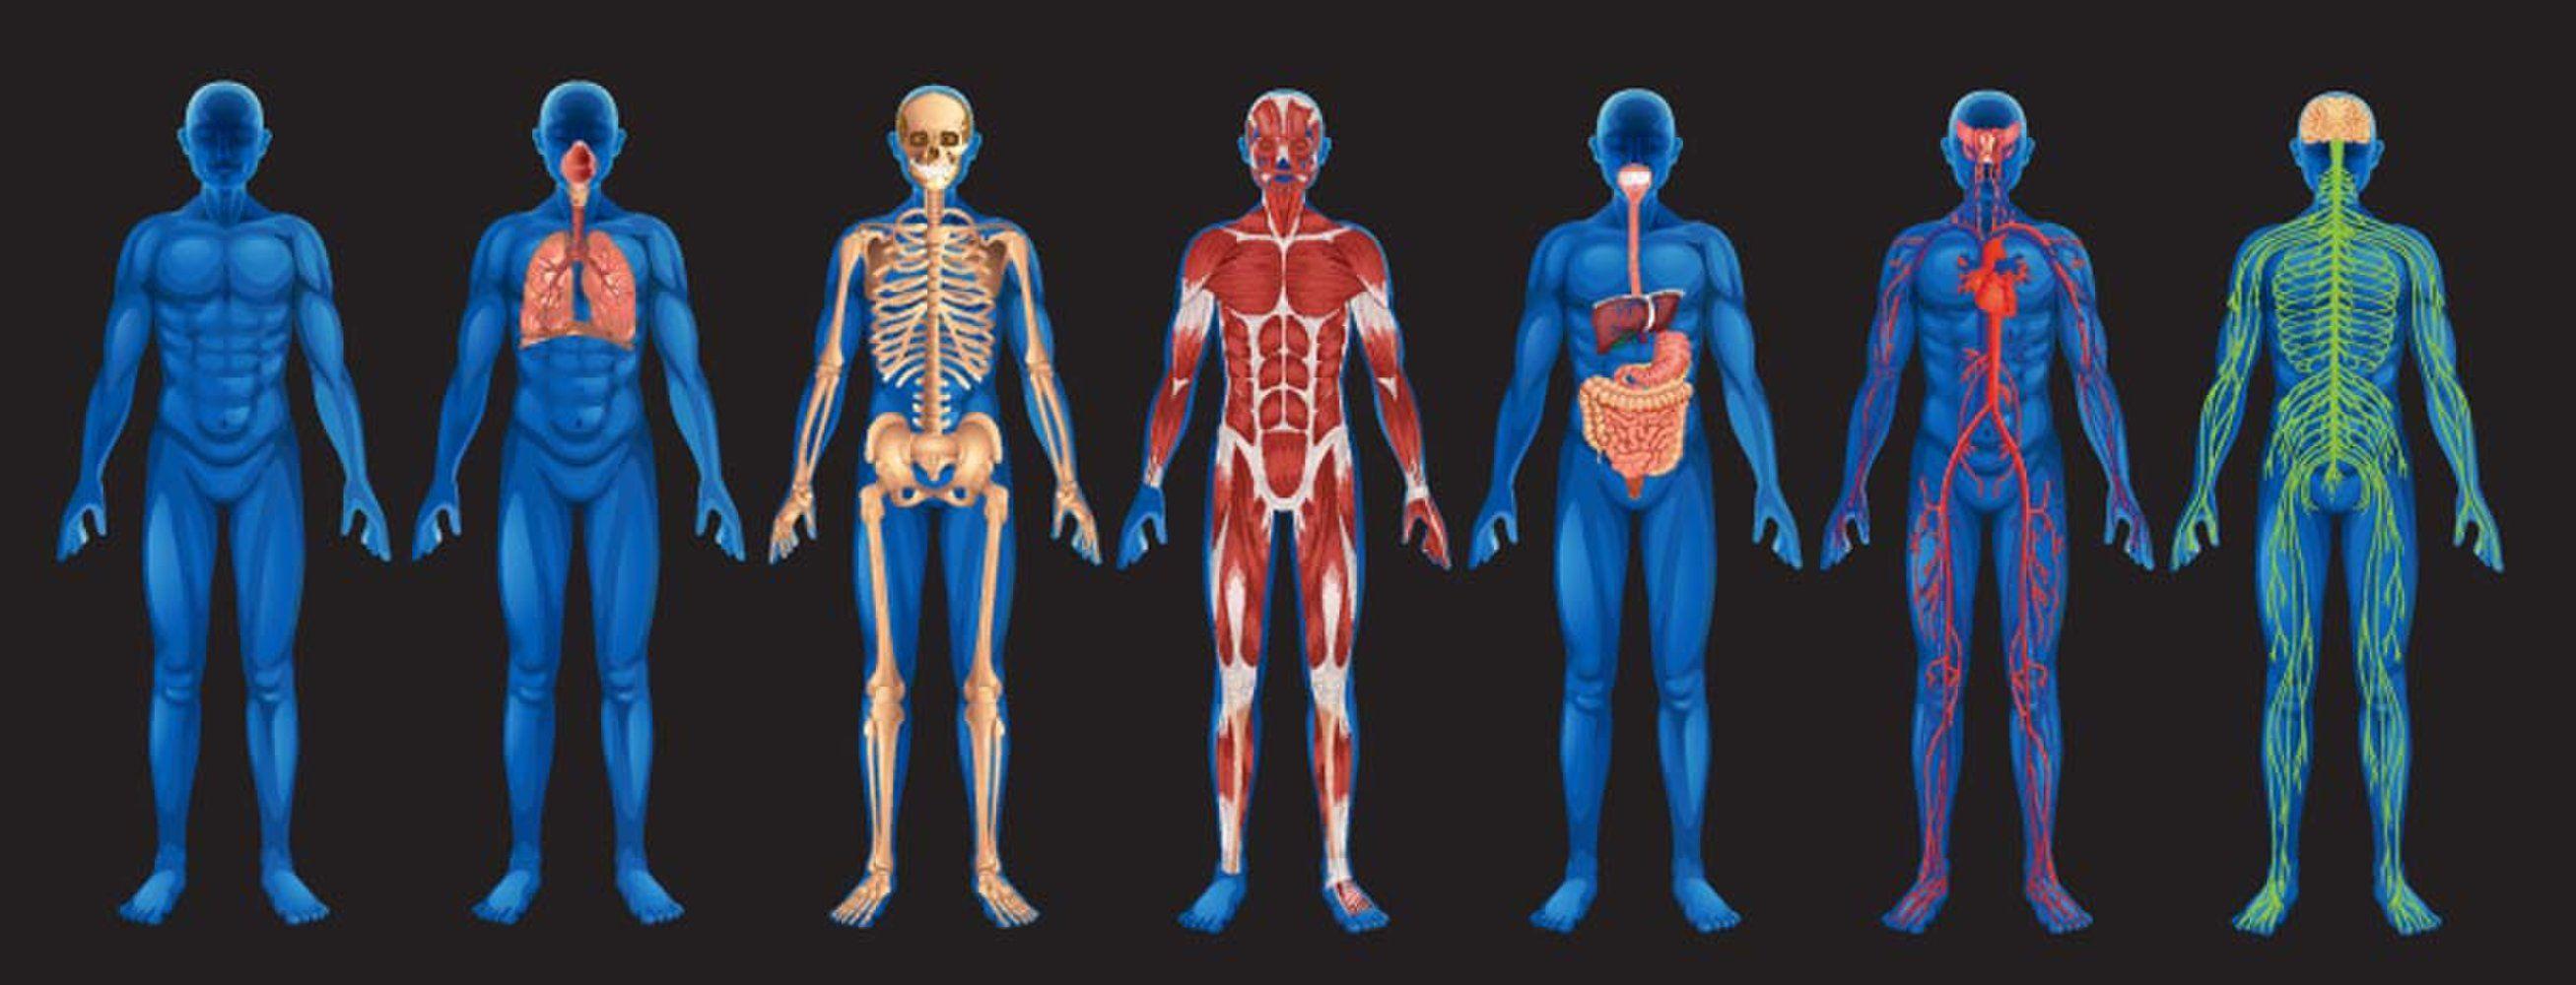 The unfashionable human body 85